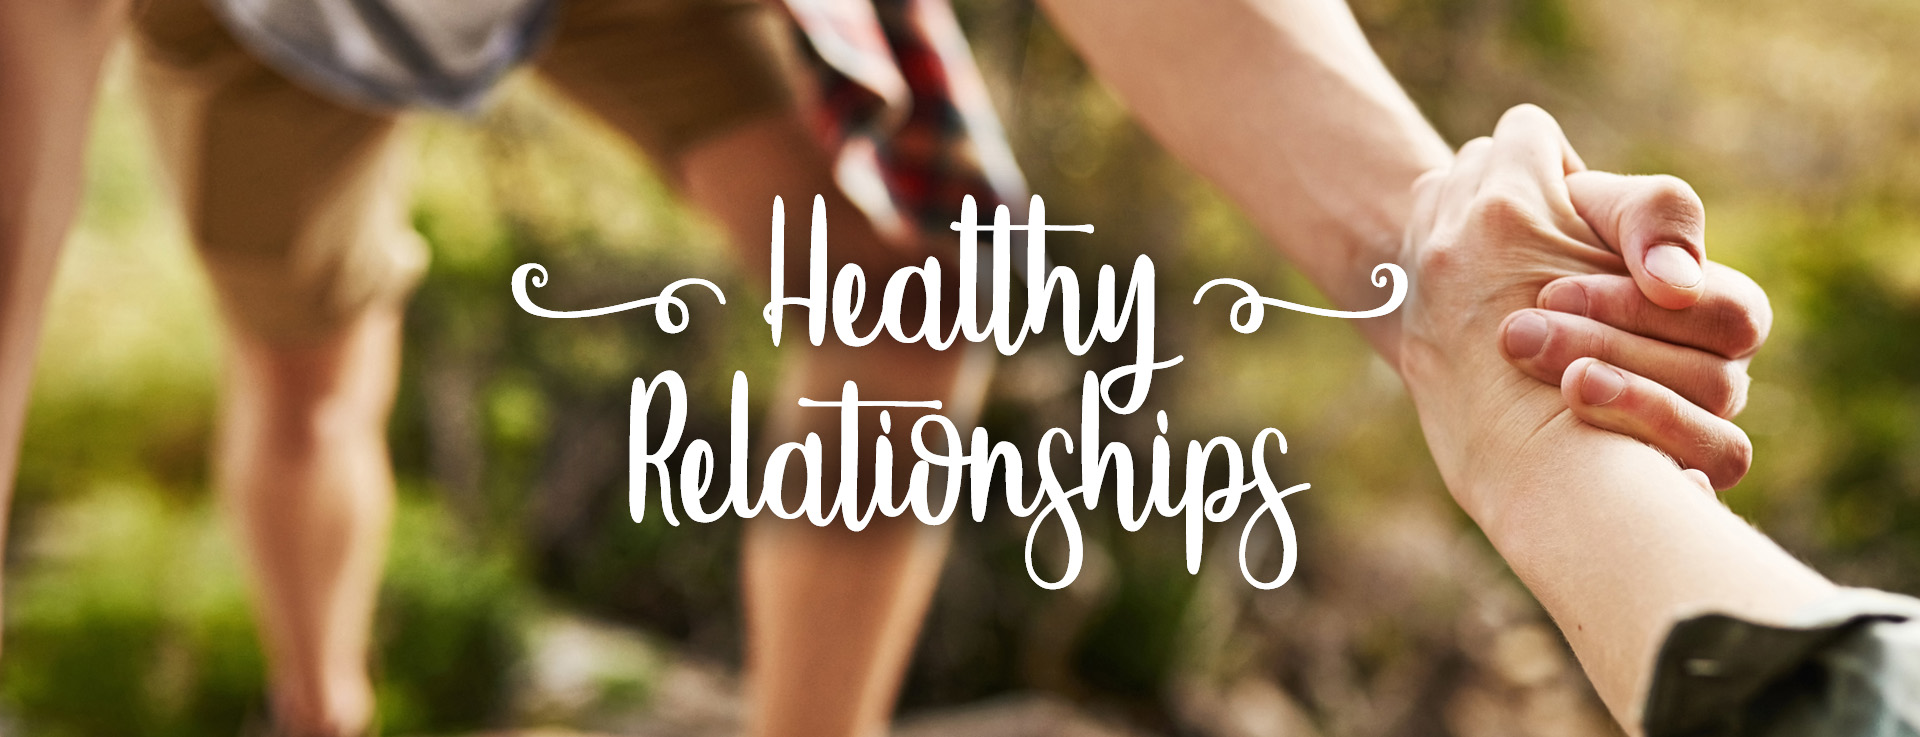 Healthy Relationships - Narrow.jpg